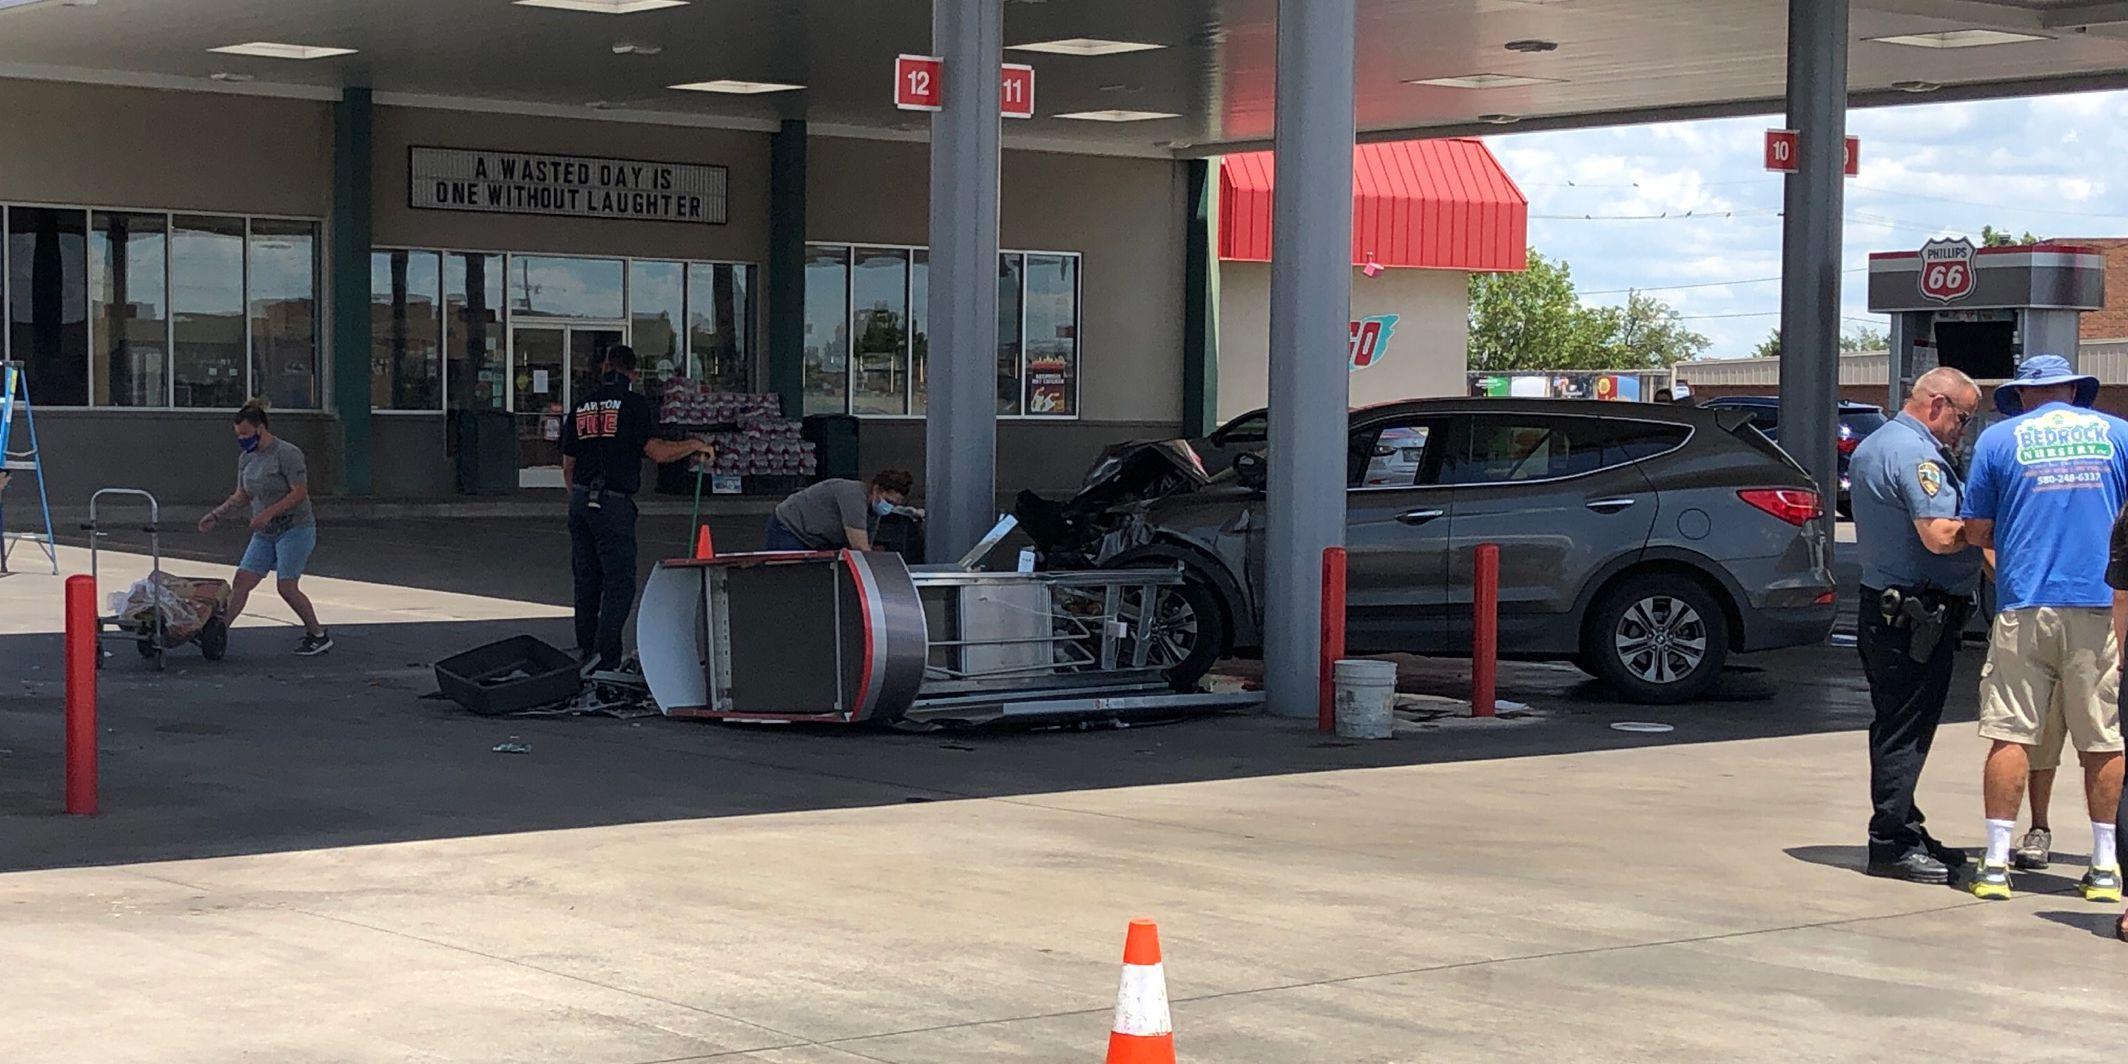 Man dies after crash at Lawton gas station